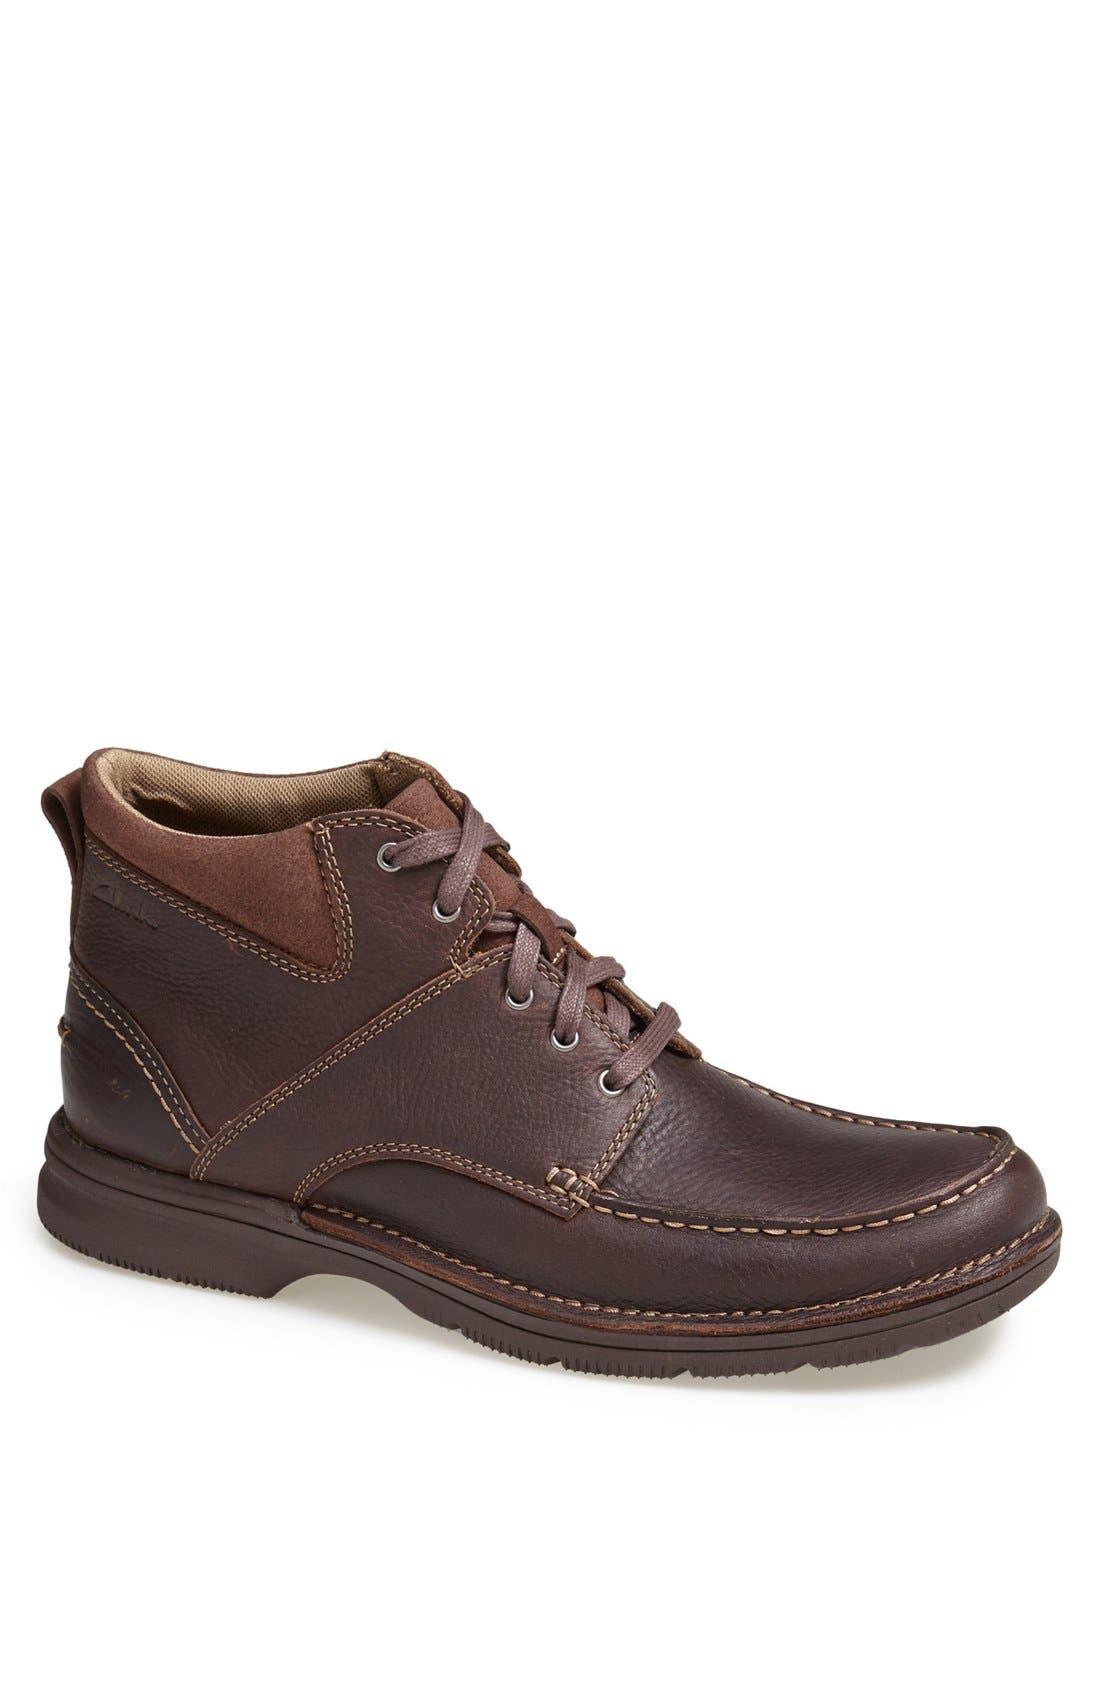 Alternate Image 1 Selected - Clarks® 'Senner Court' Moc Toe Boot